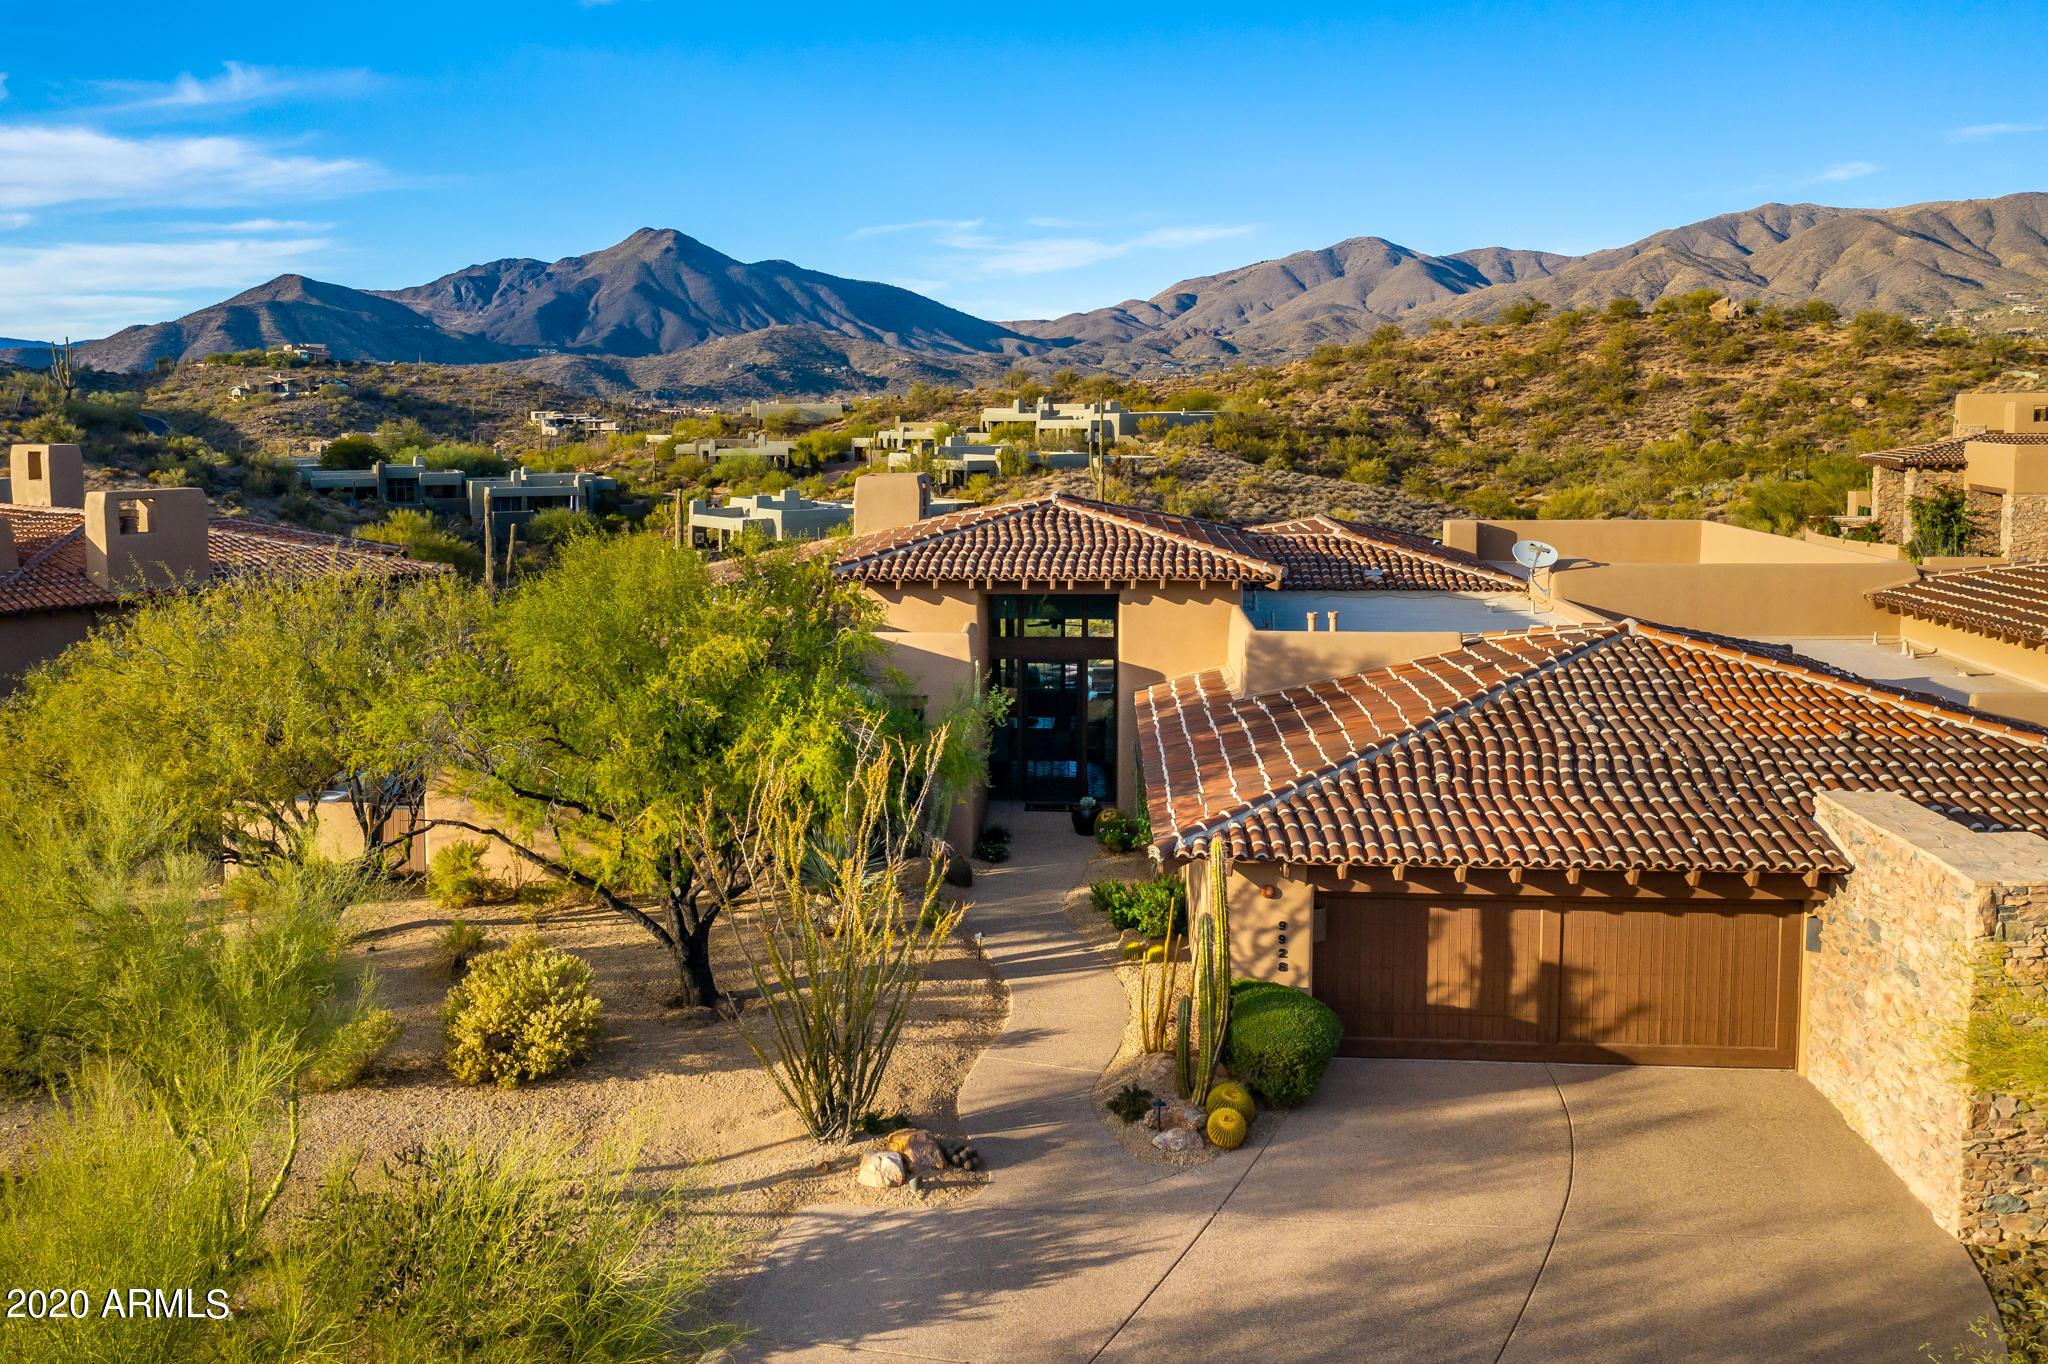 Photo of 9928 E LOOKOUT MOUNTAIN Drive, Scottsdale, AZ 85262